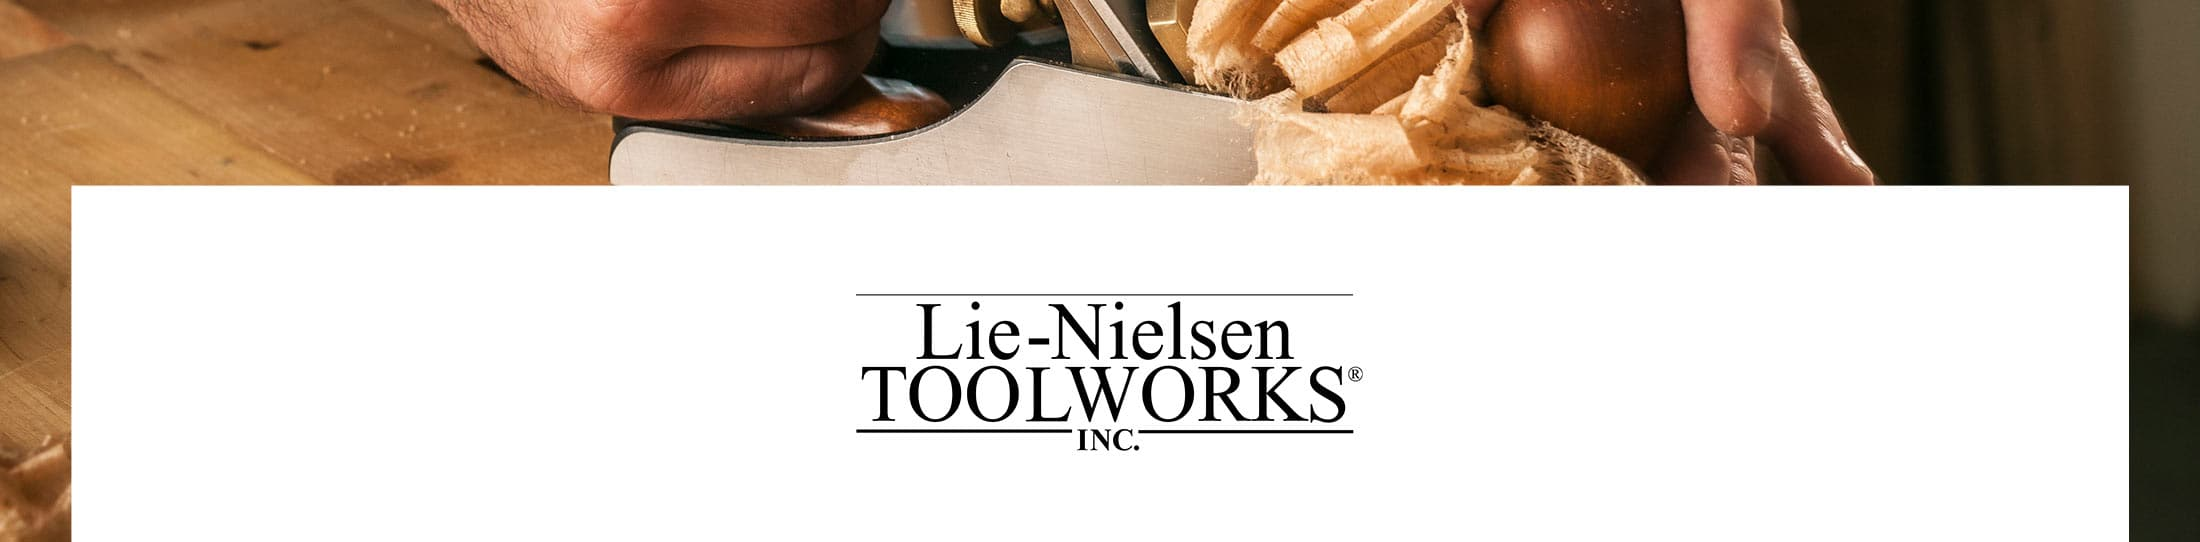 Lie Nielsen